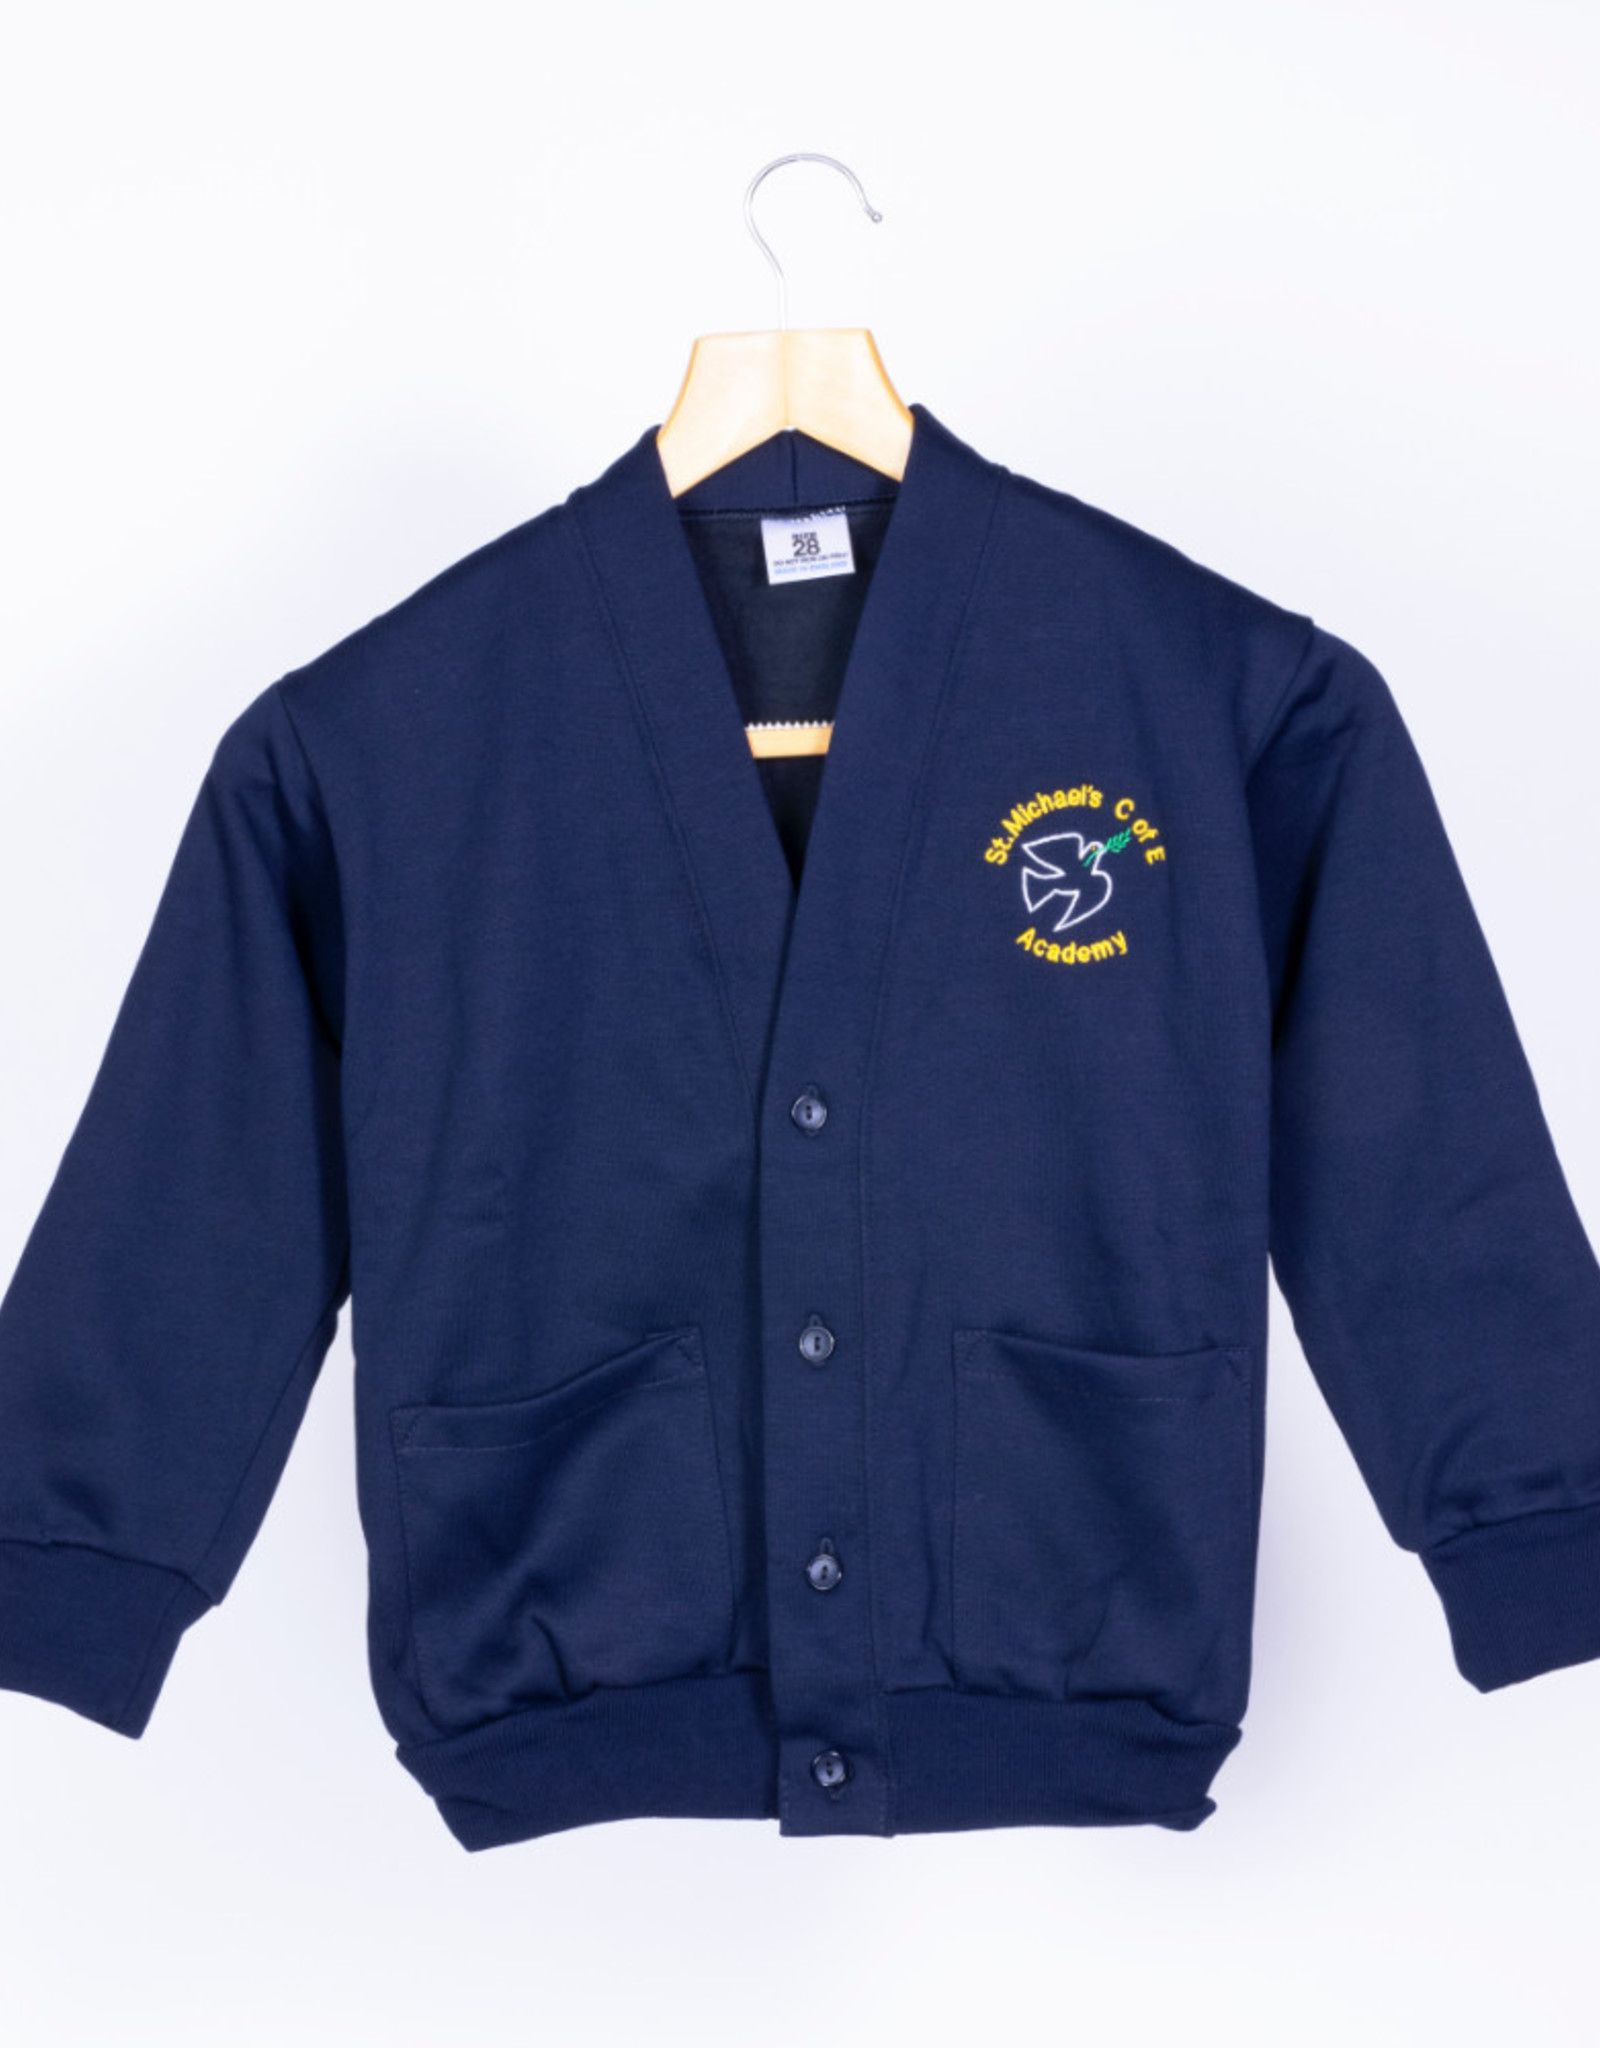 Cardigan Child Size - St Michaels CE Academy